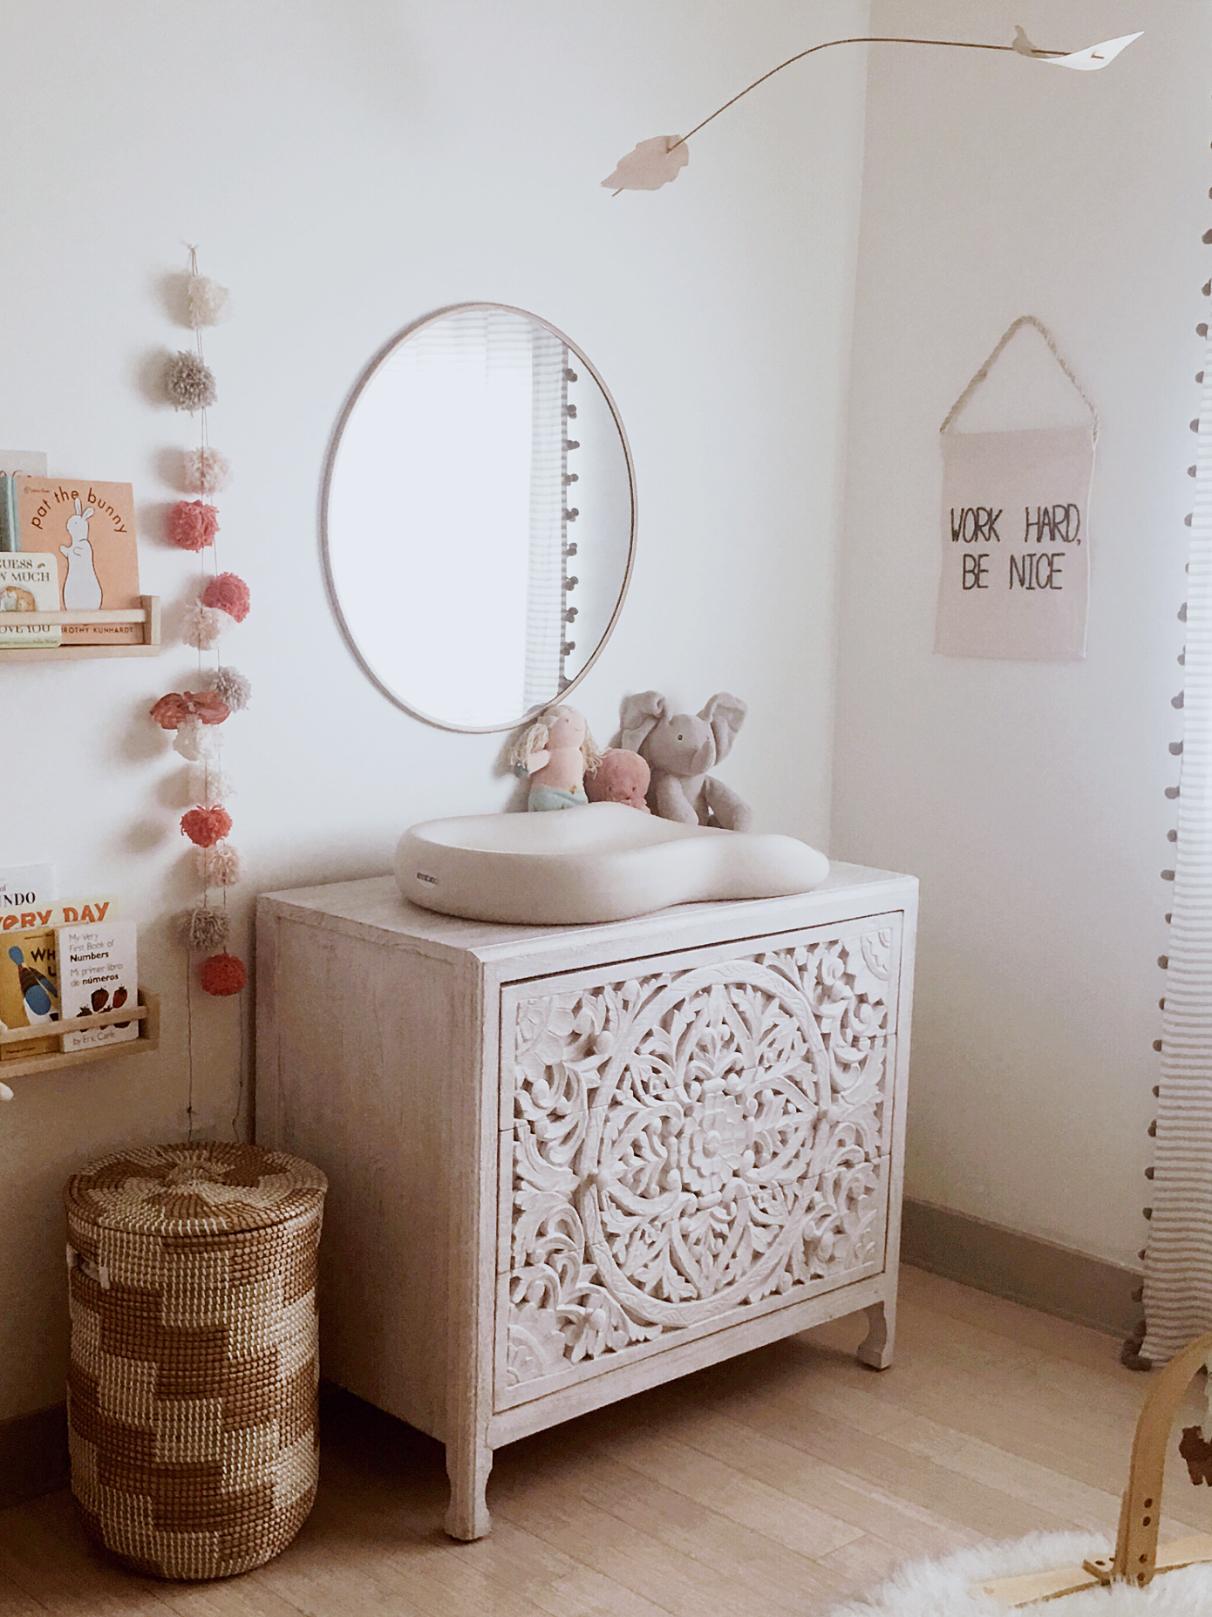 the modhemian neutral nursery, Poppys nursery